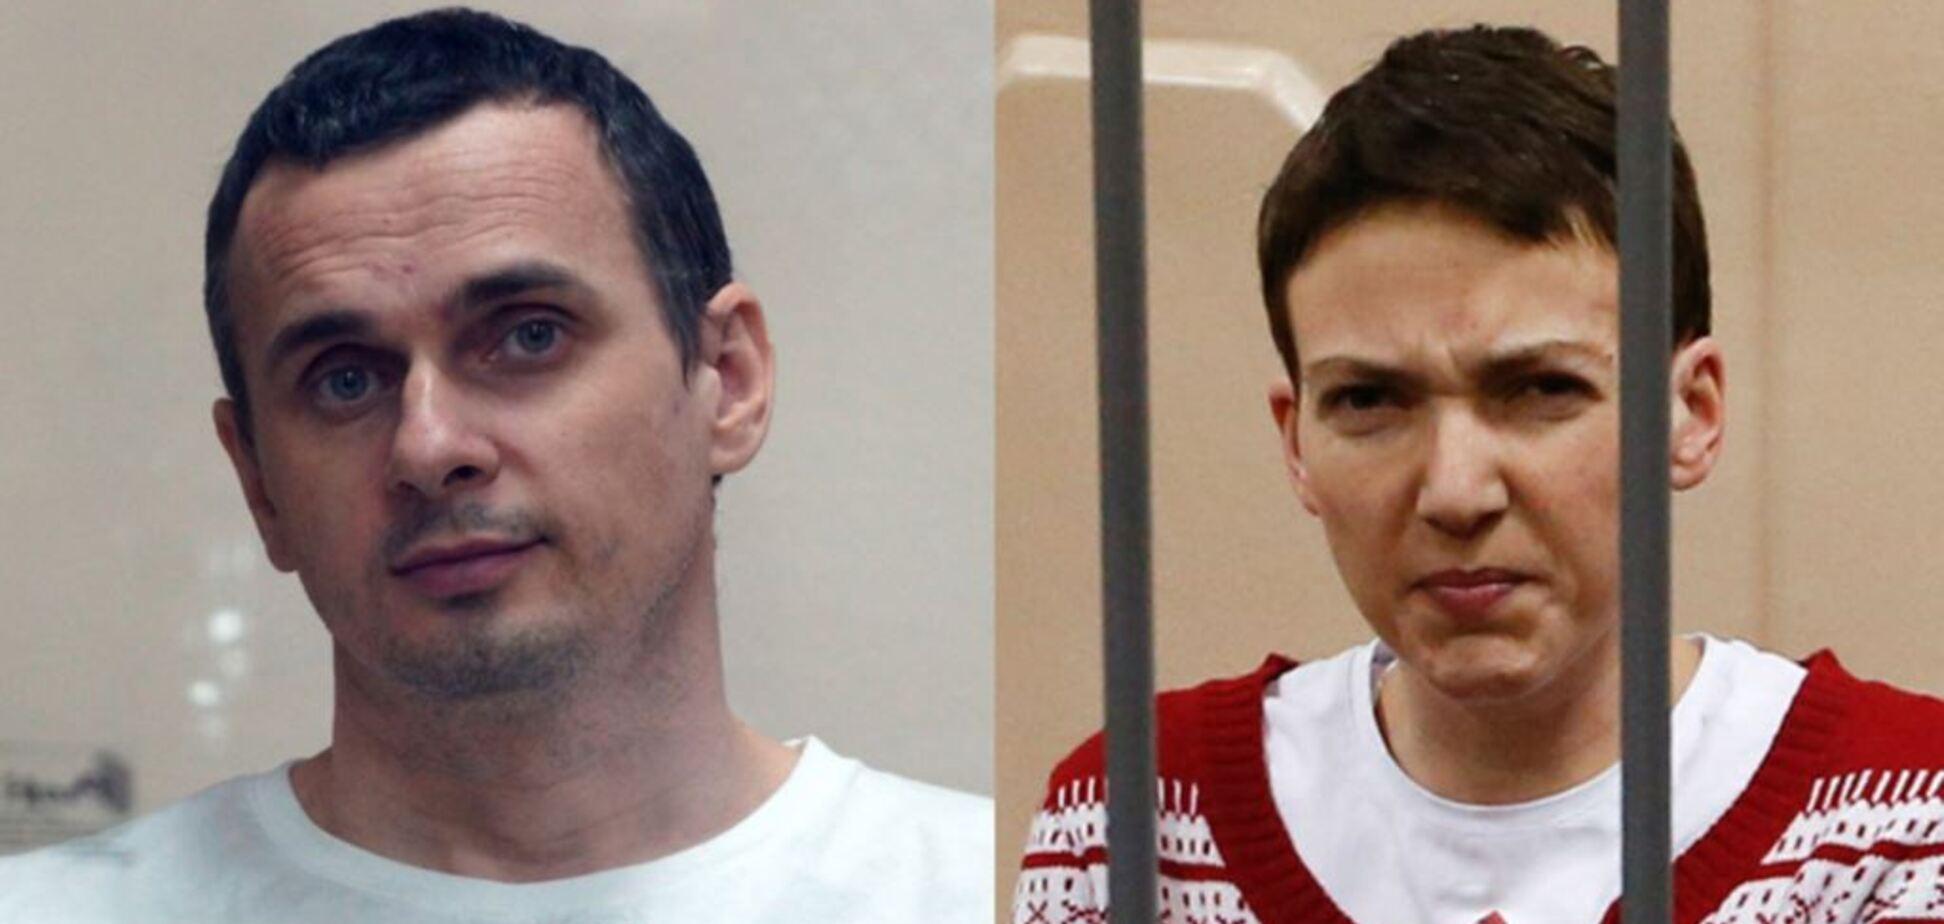 Ми обпеклись на Савченко, а тепер дмухаємо на Сєнцова